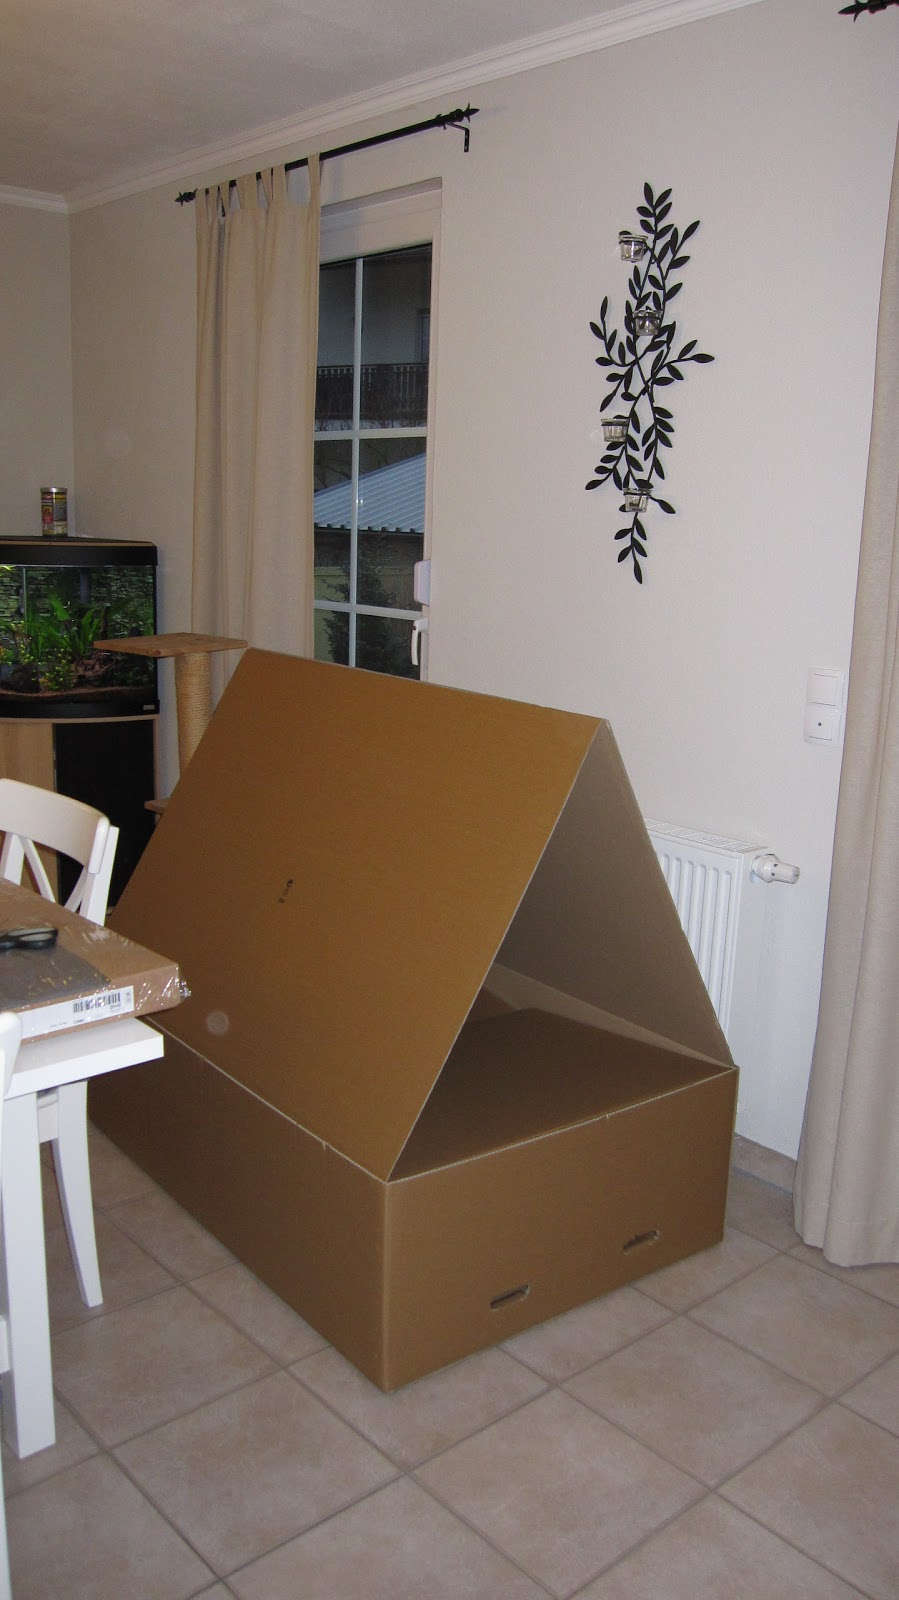 kleines gelbes haus heute bloggt kater maurice. Black Bedroom Furniture Sets. Home Design Ideas